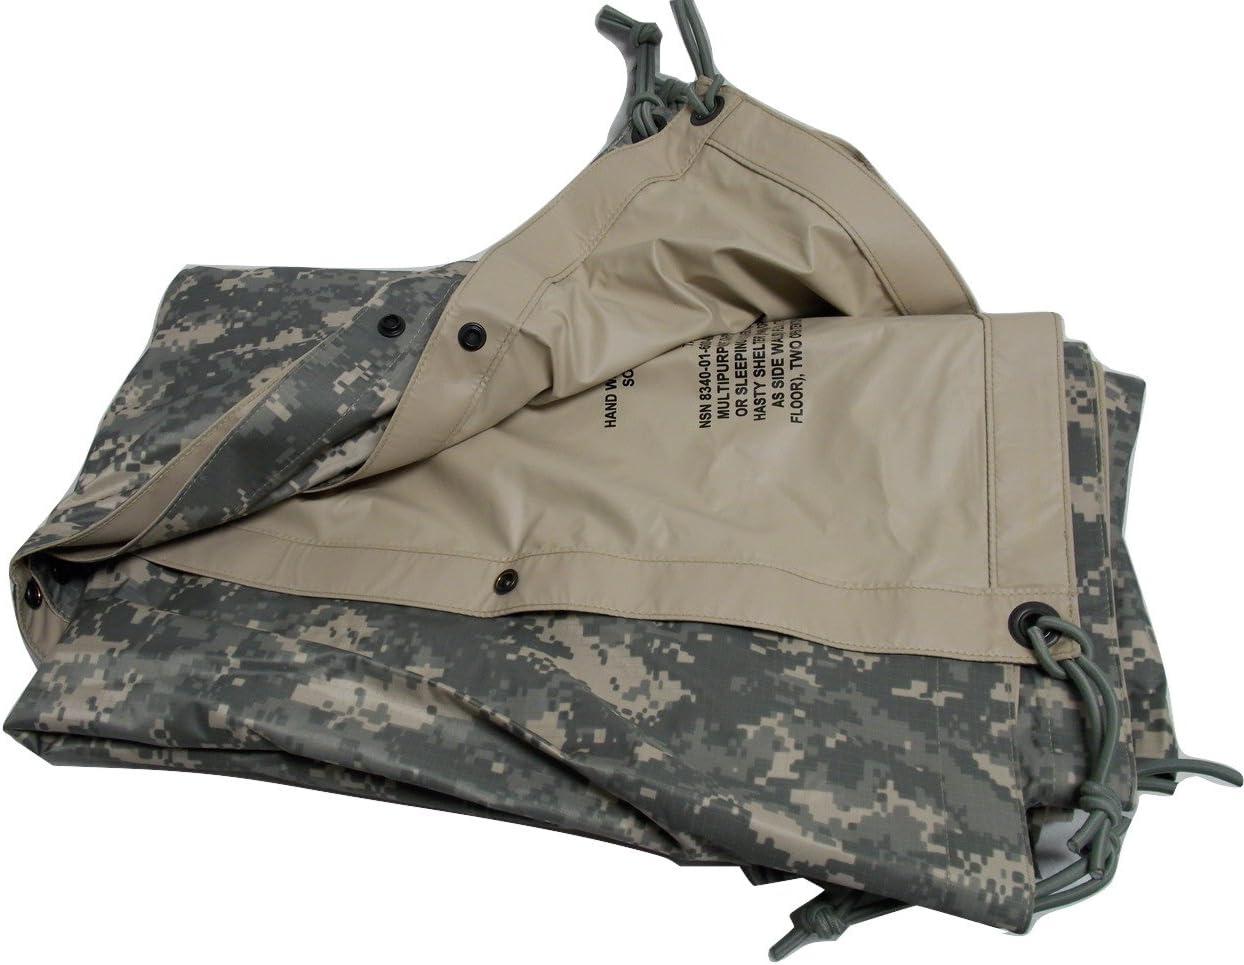 USGI Army FIELD TARP Tarpaulin ACU reversible 92X82 Waterproof Cloth Shelter VGC